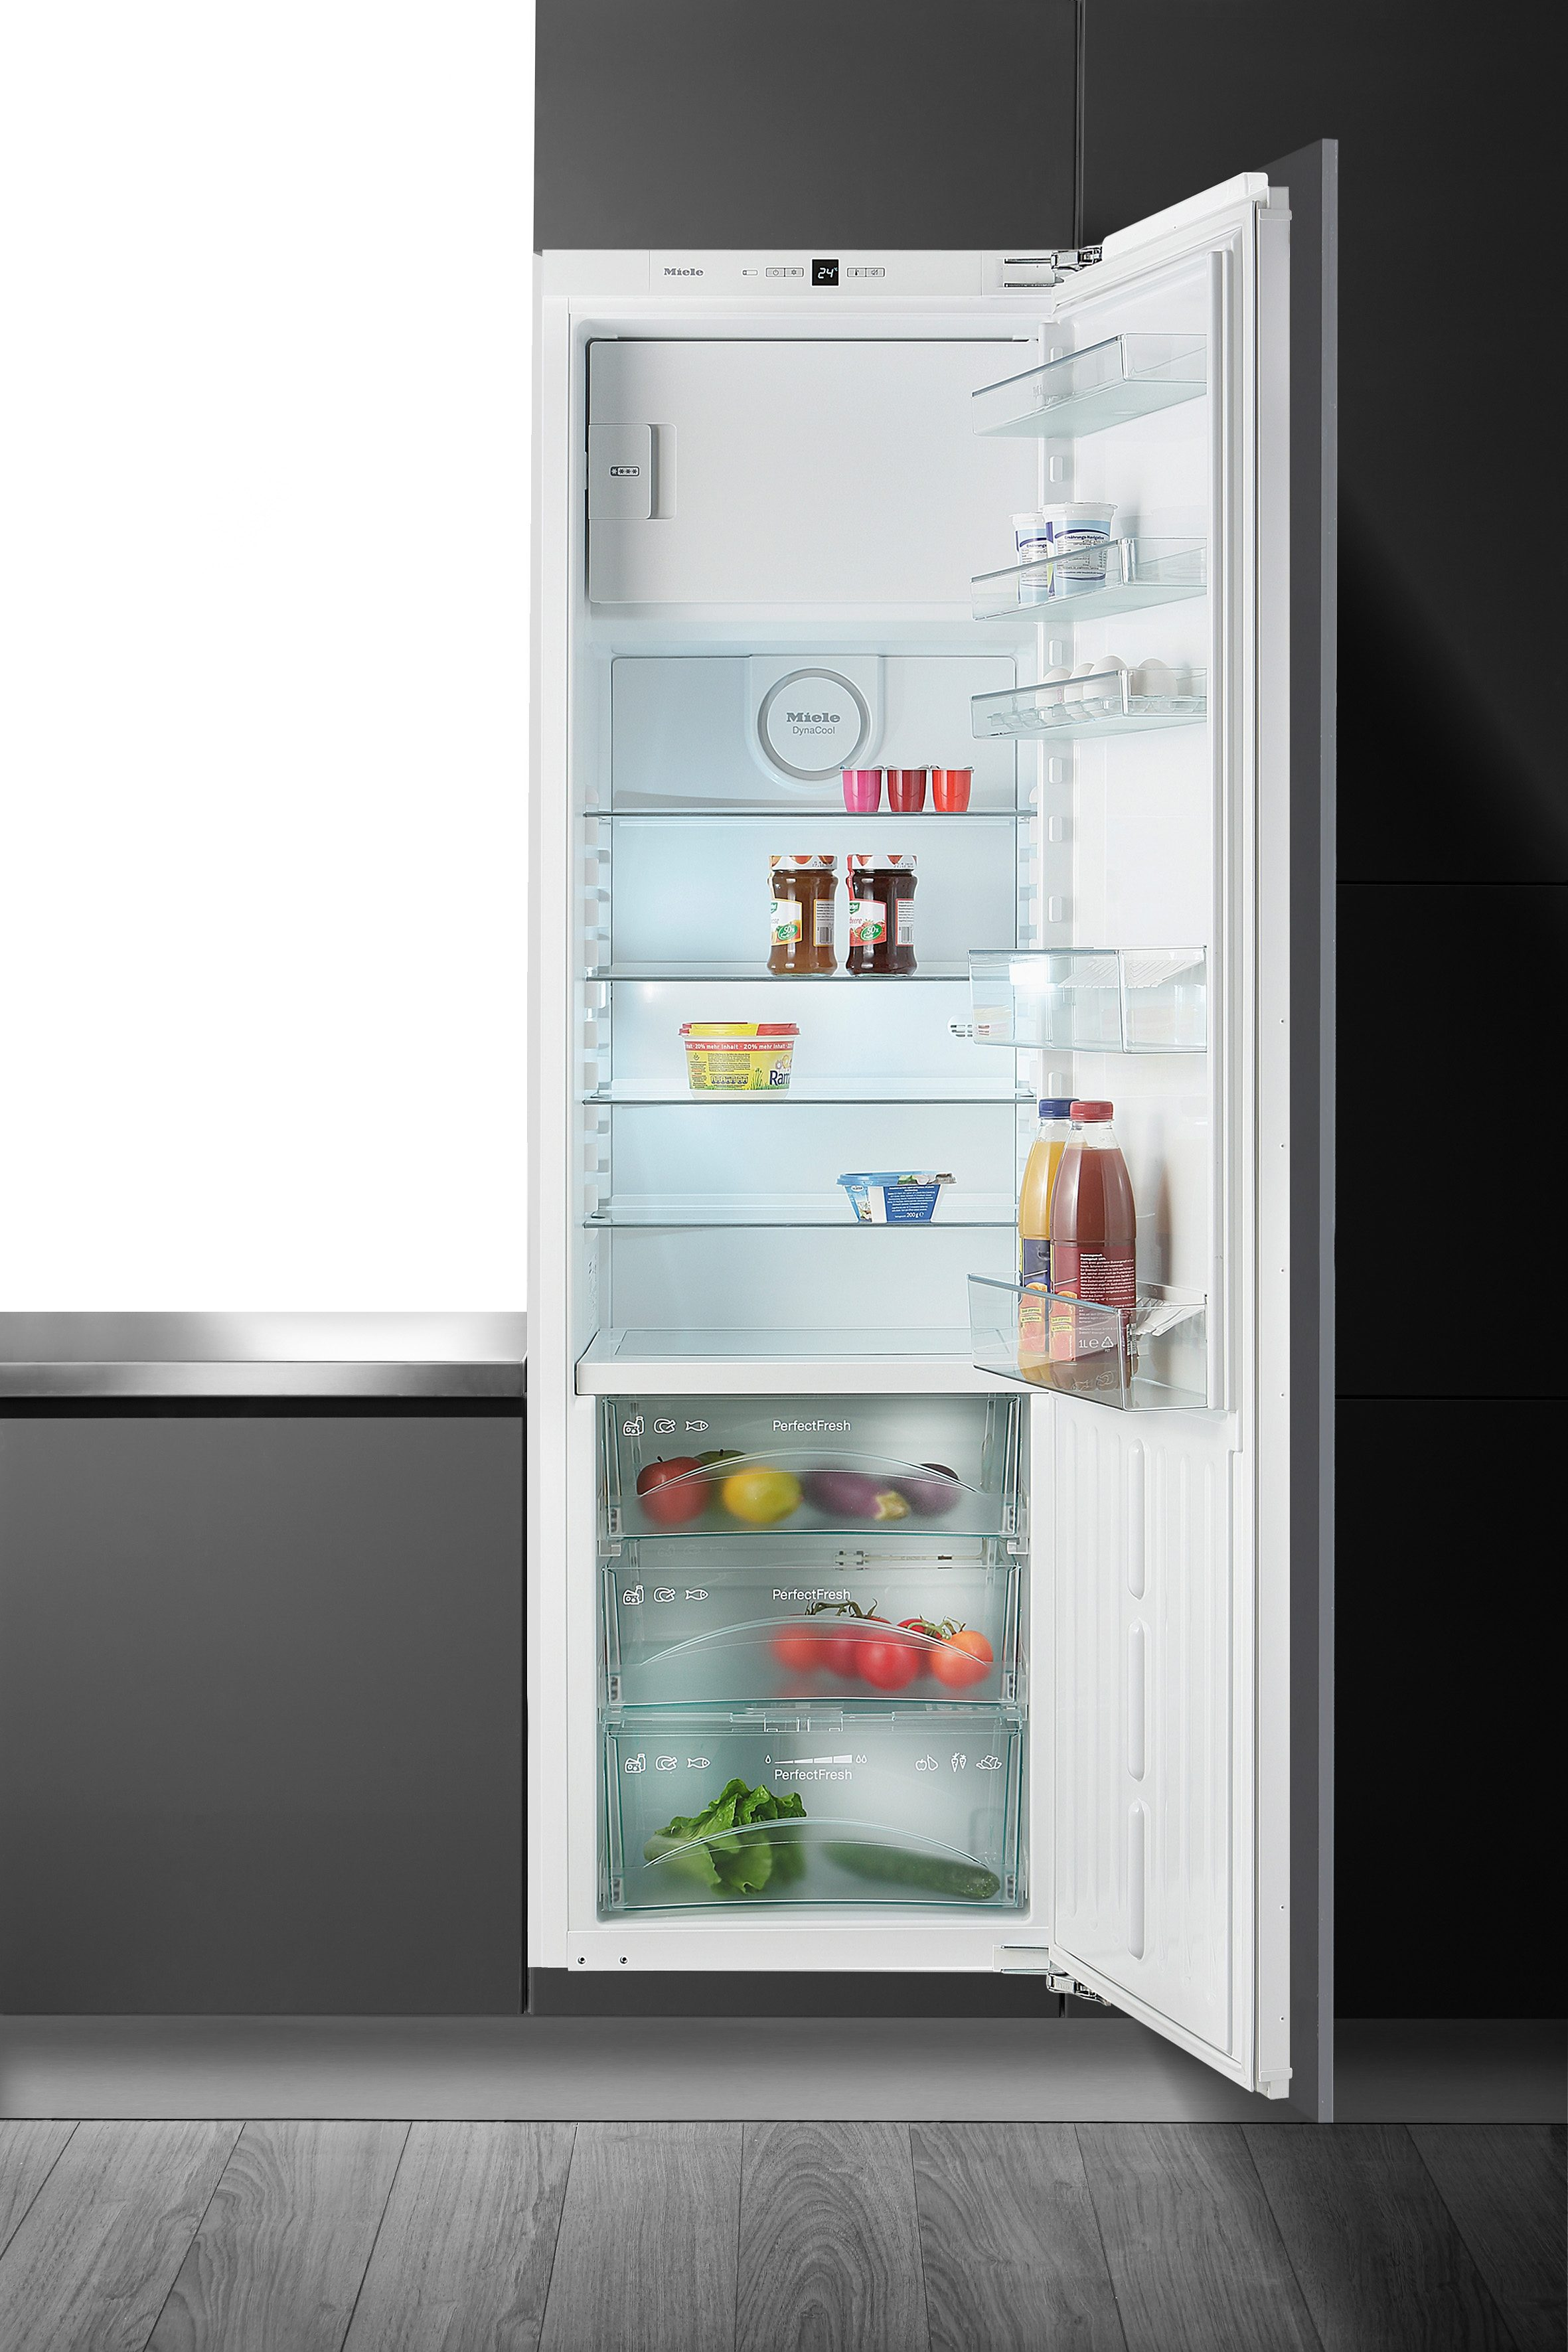 Miele integrierbarer Einbau-Kühlschrank K 37282 iDF, A++, 177 cm